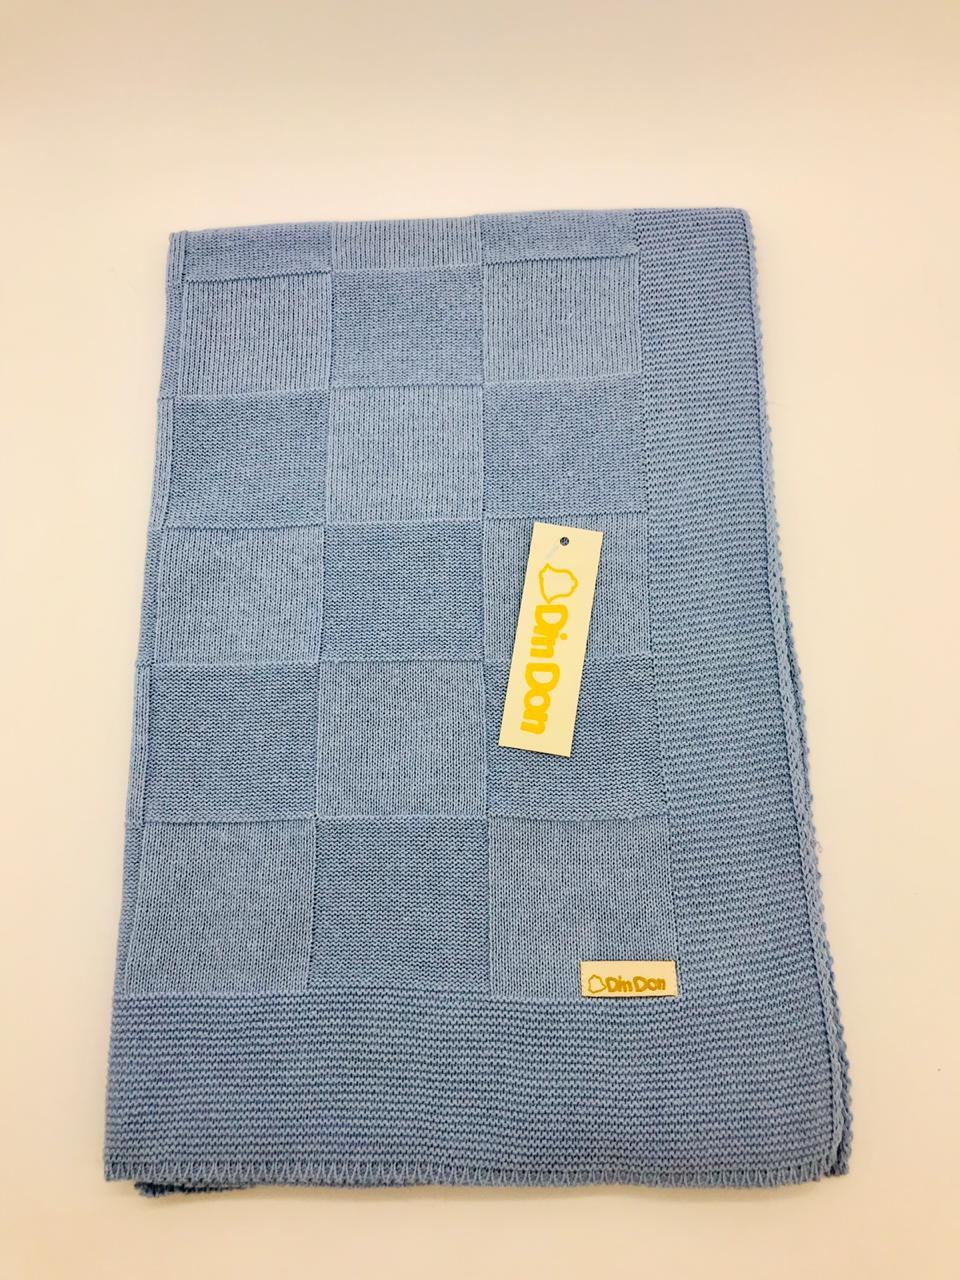 Manta Quadradinha Luxo Cor Azul Bebe - Din Don Ref Dd1001 158487